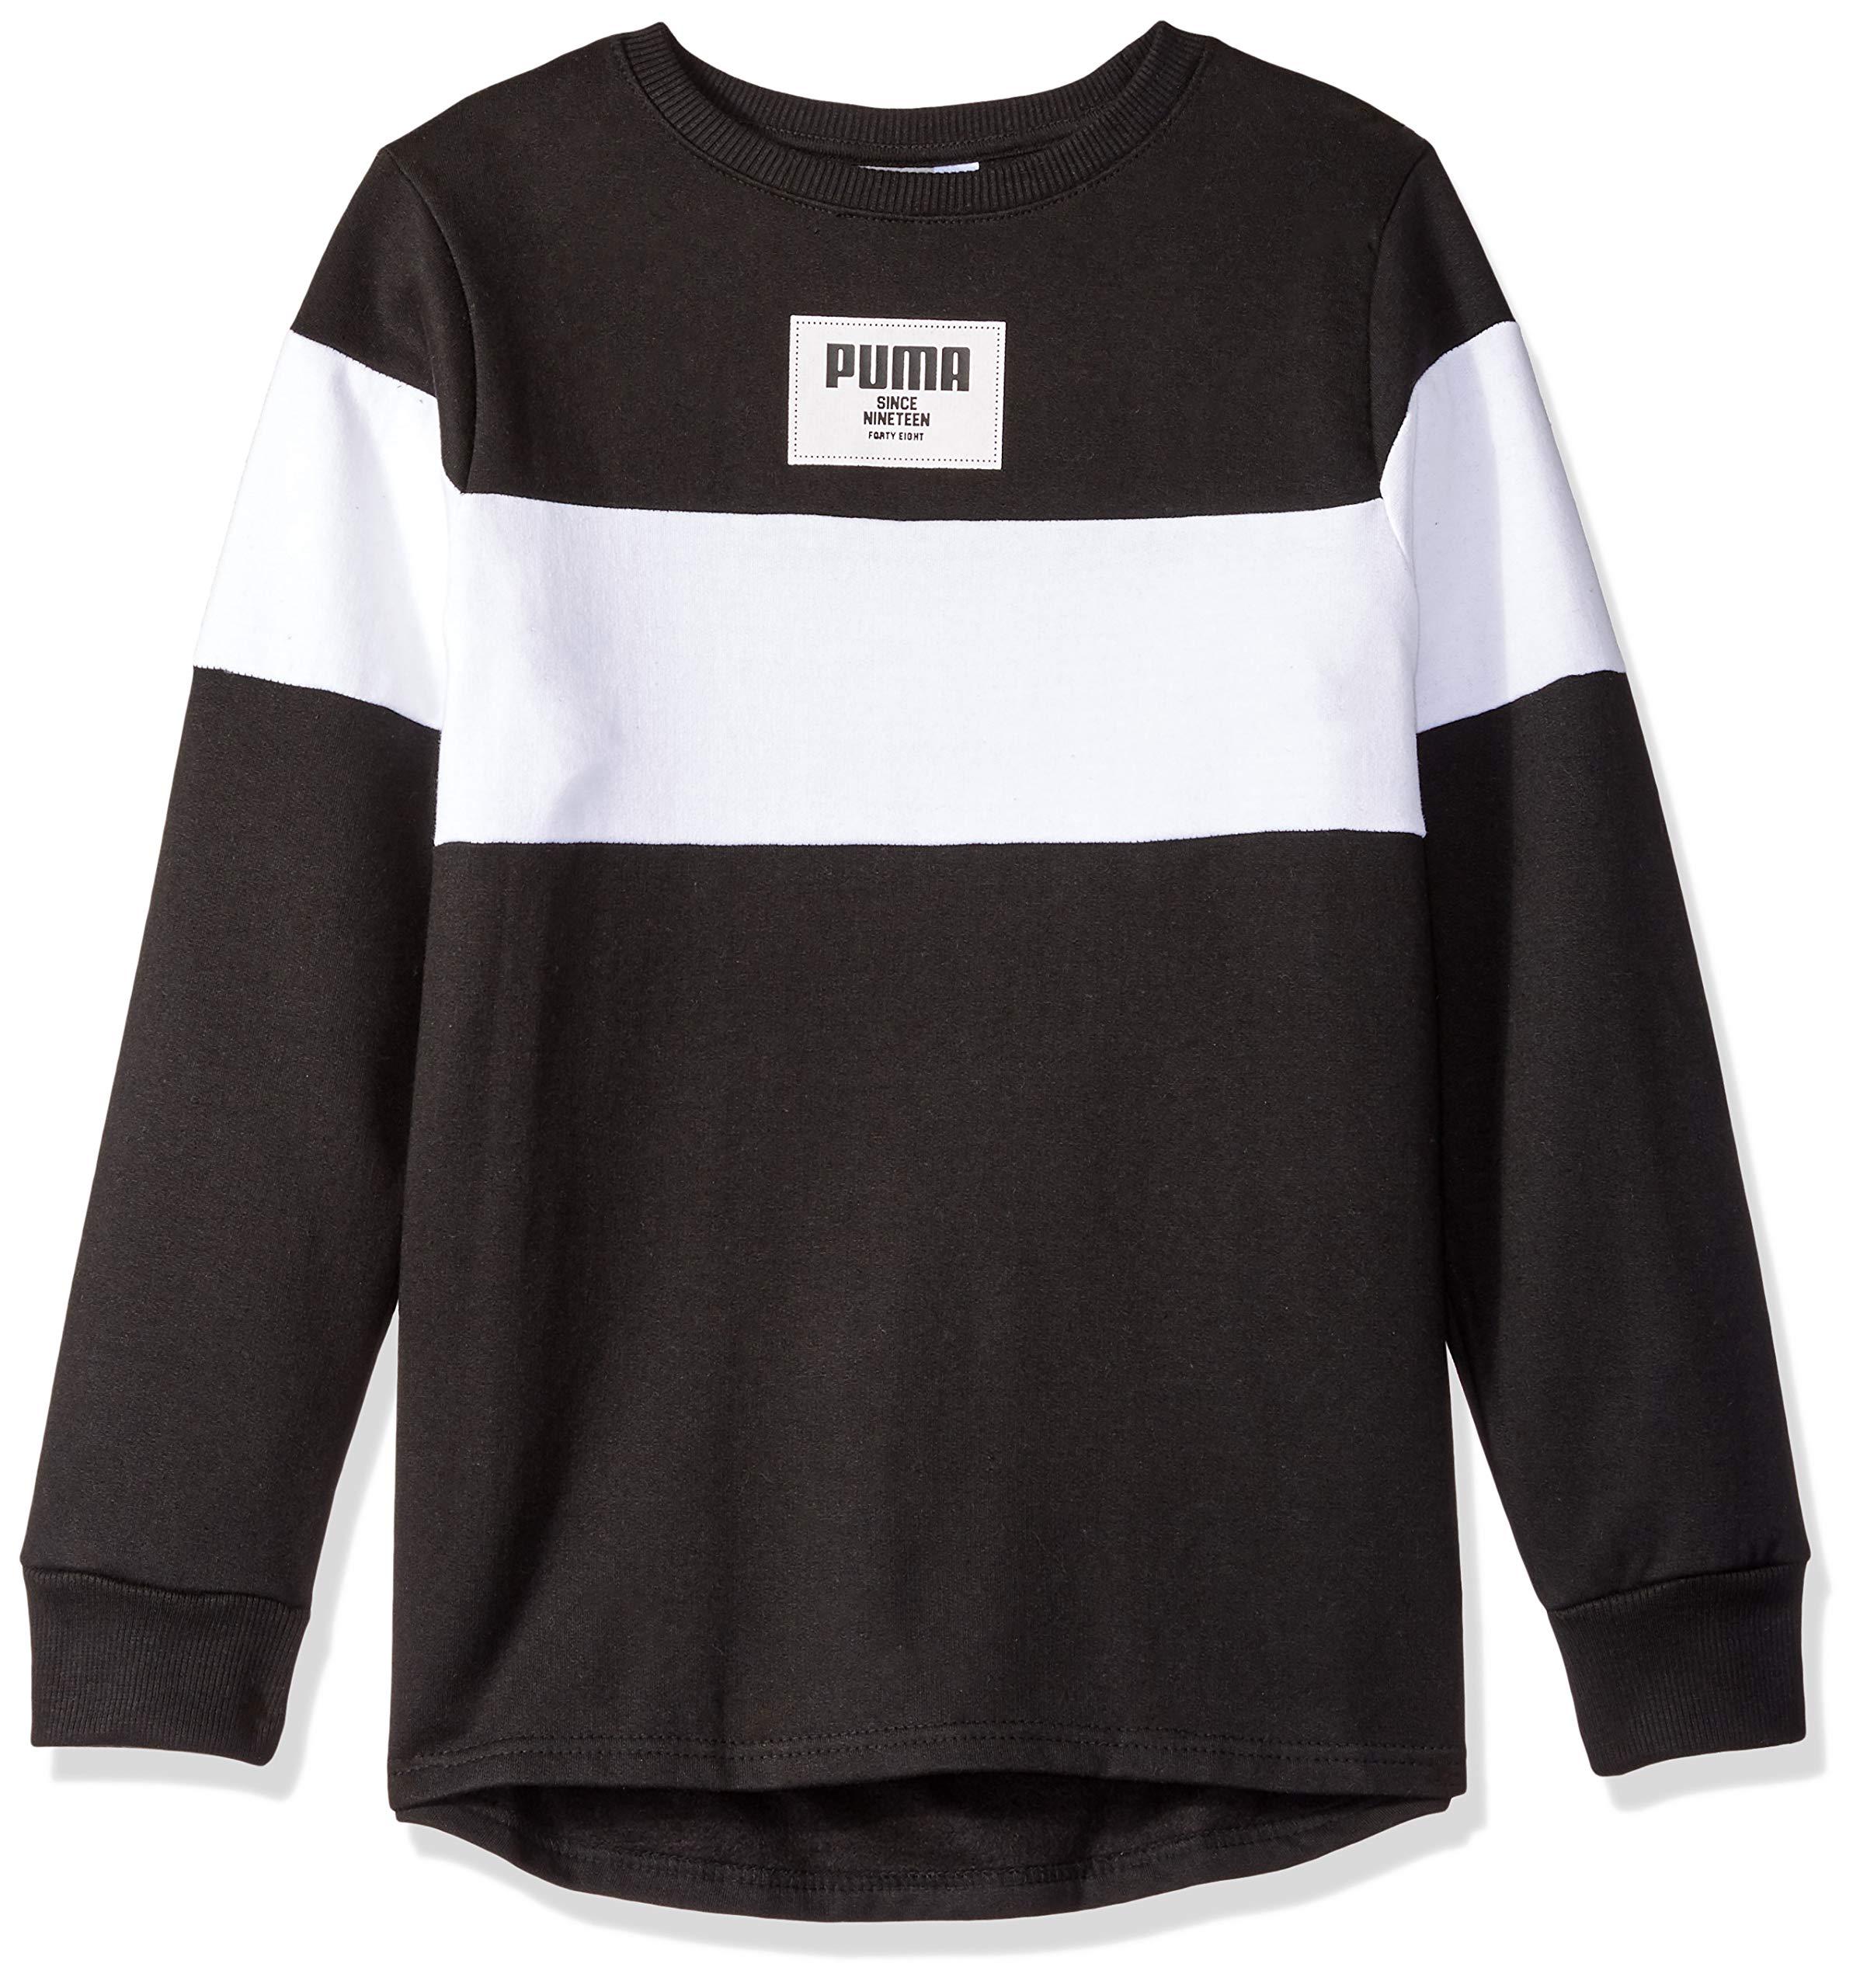 PUMA Big Boys' Fleece Sweatshirt, Black, L